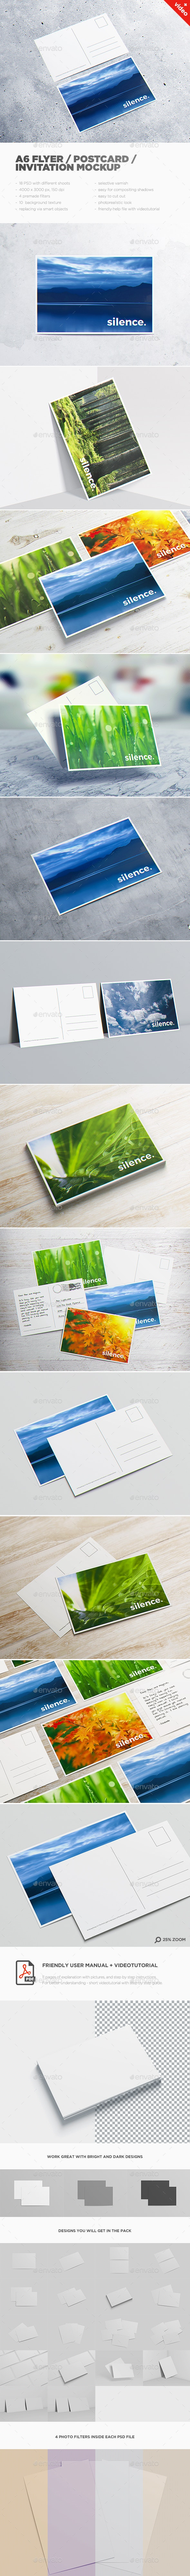 A6 Flyer / Postcard / Invitation MockUp - Miscellaneous Print